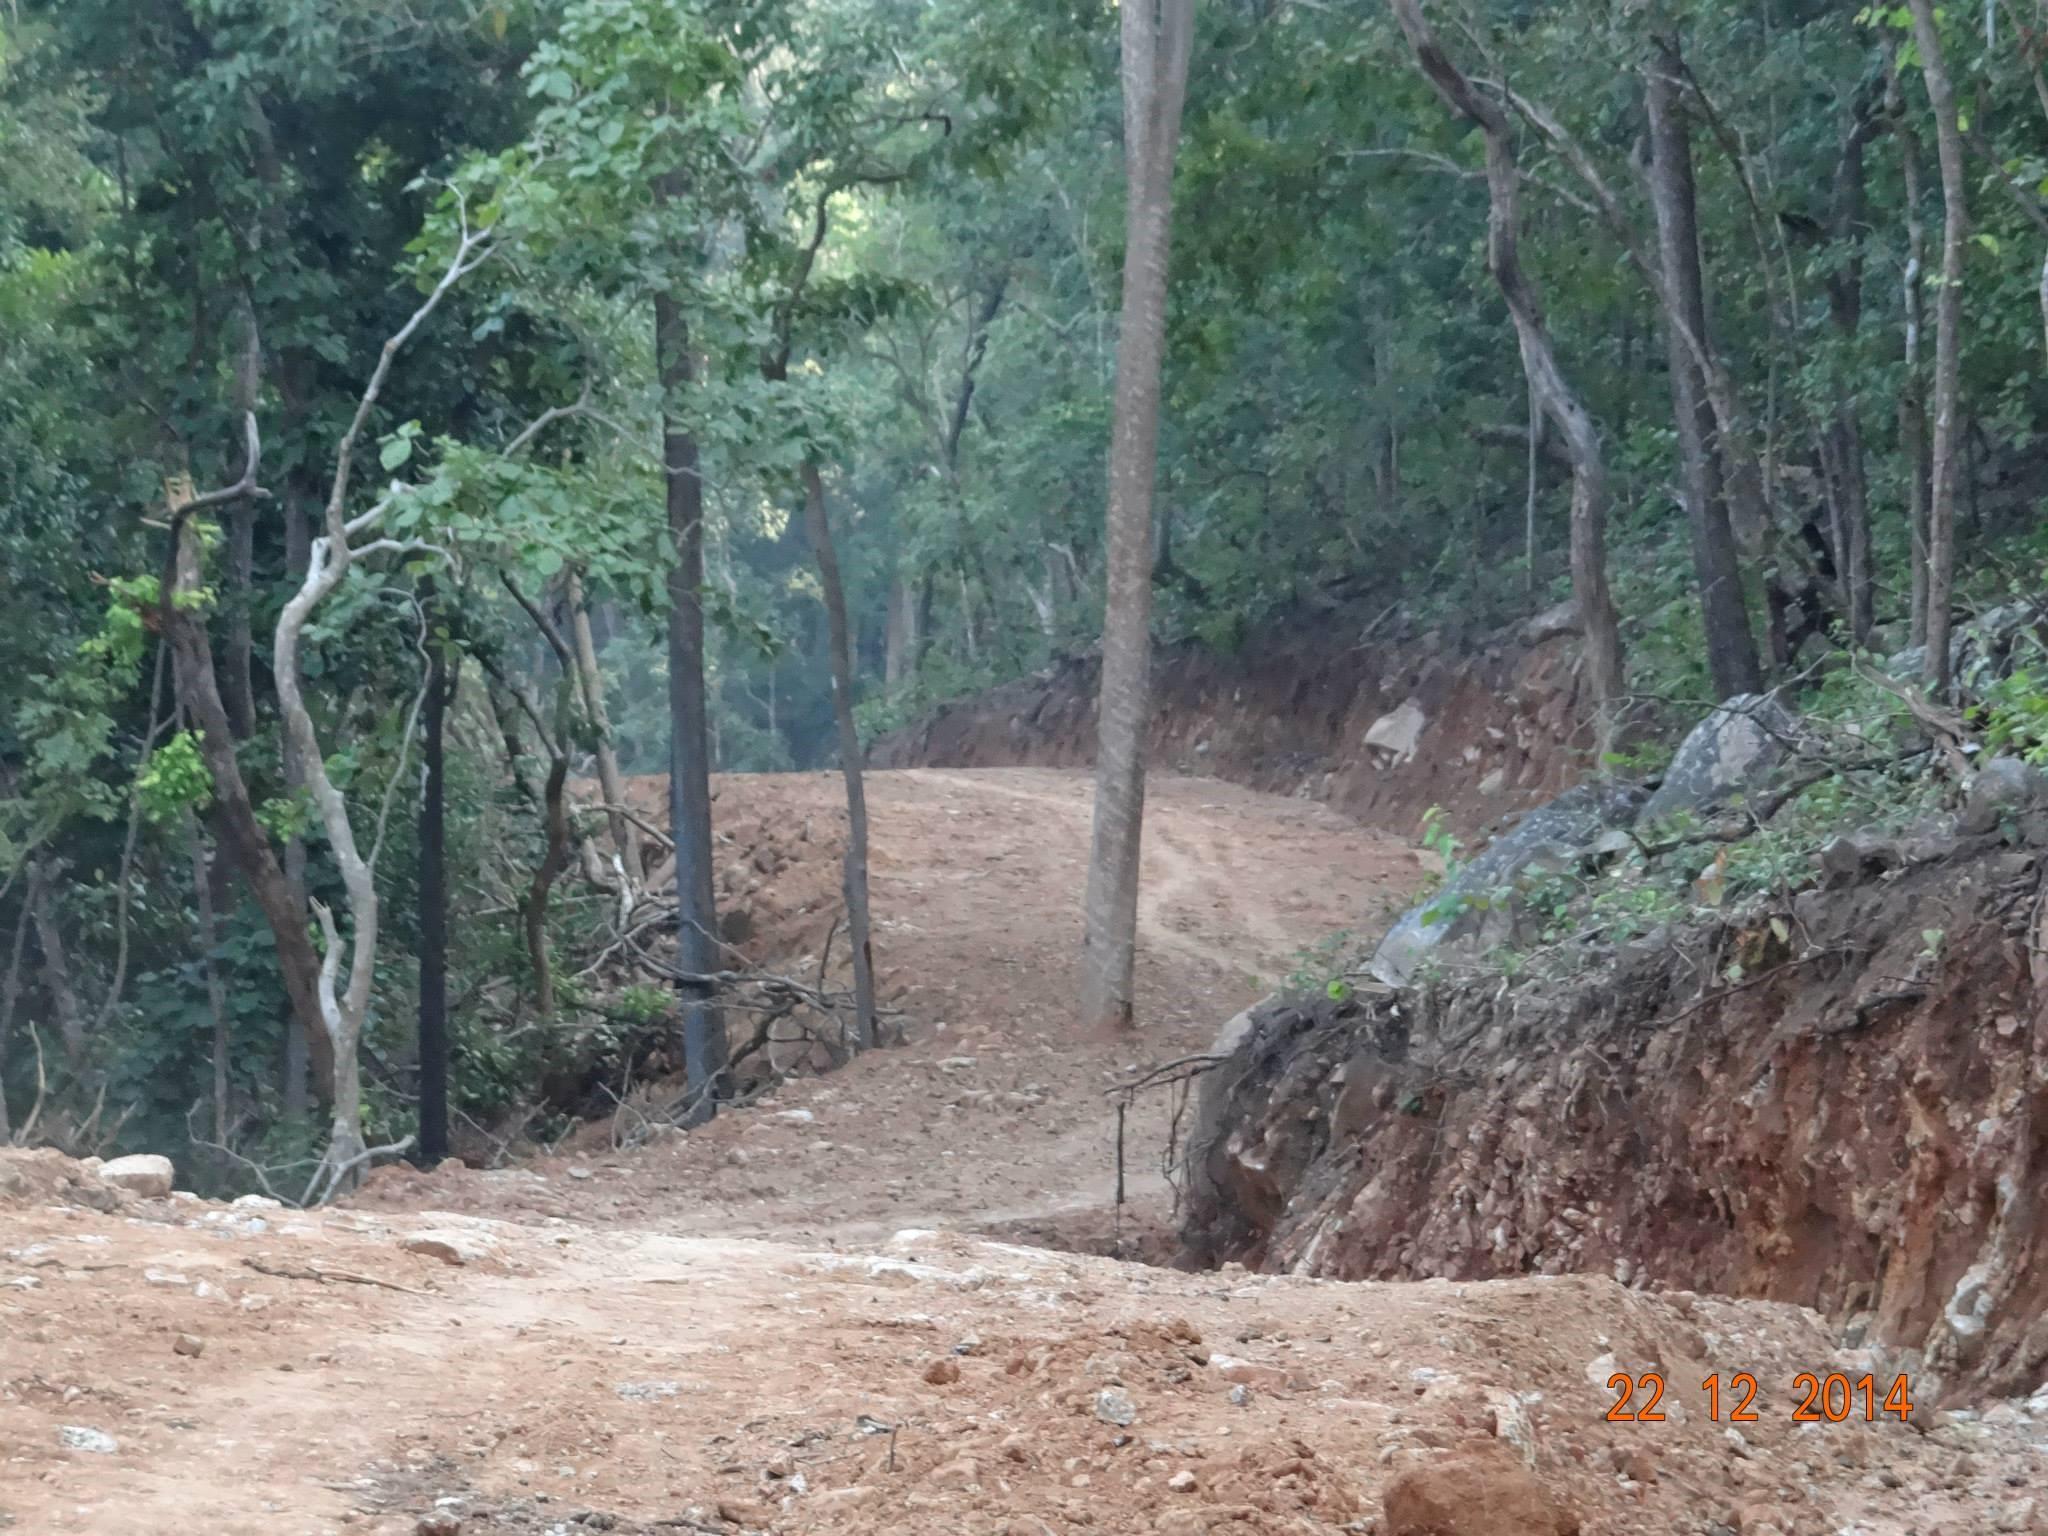 Panchayat, Odisha